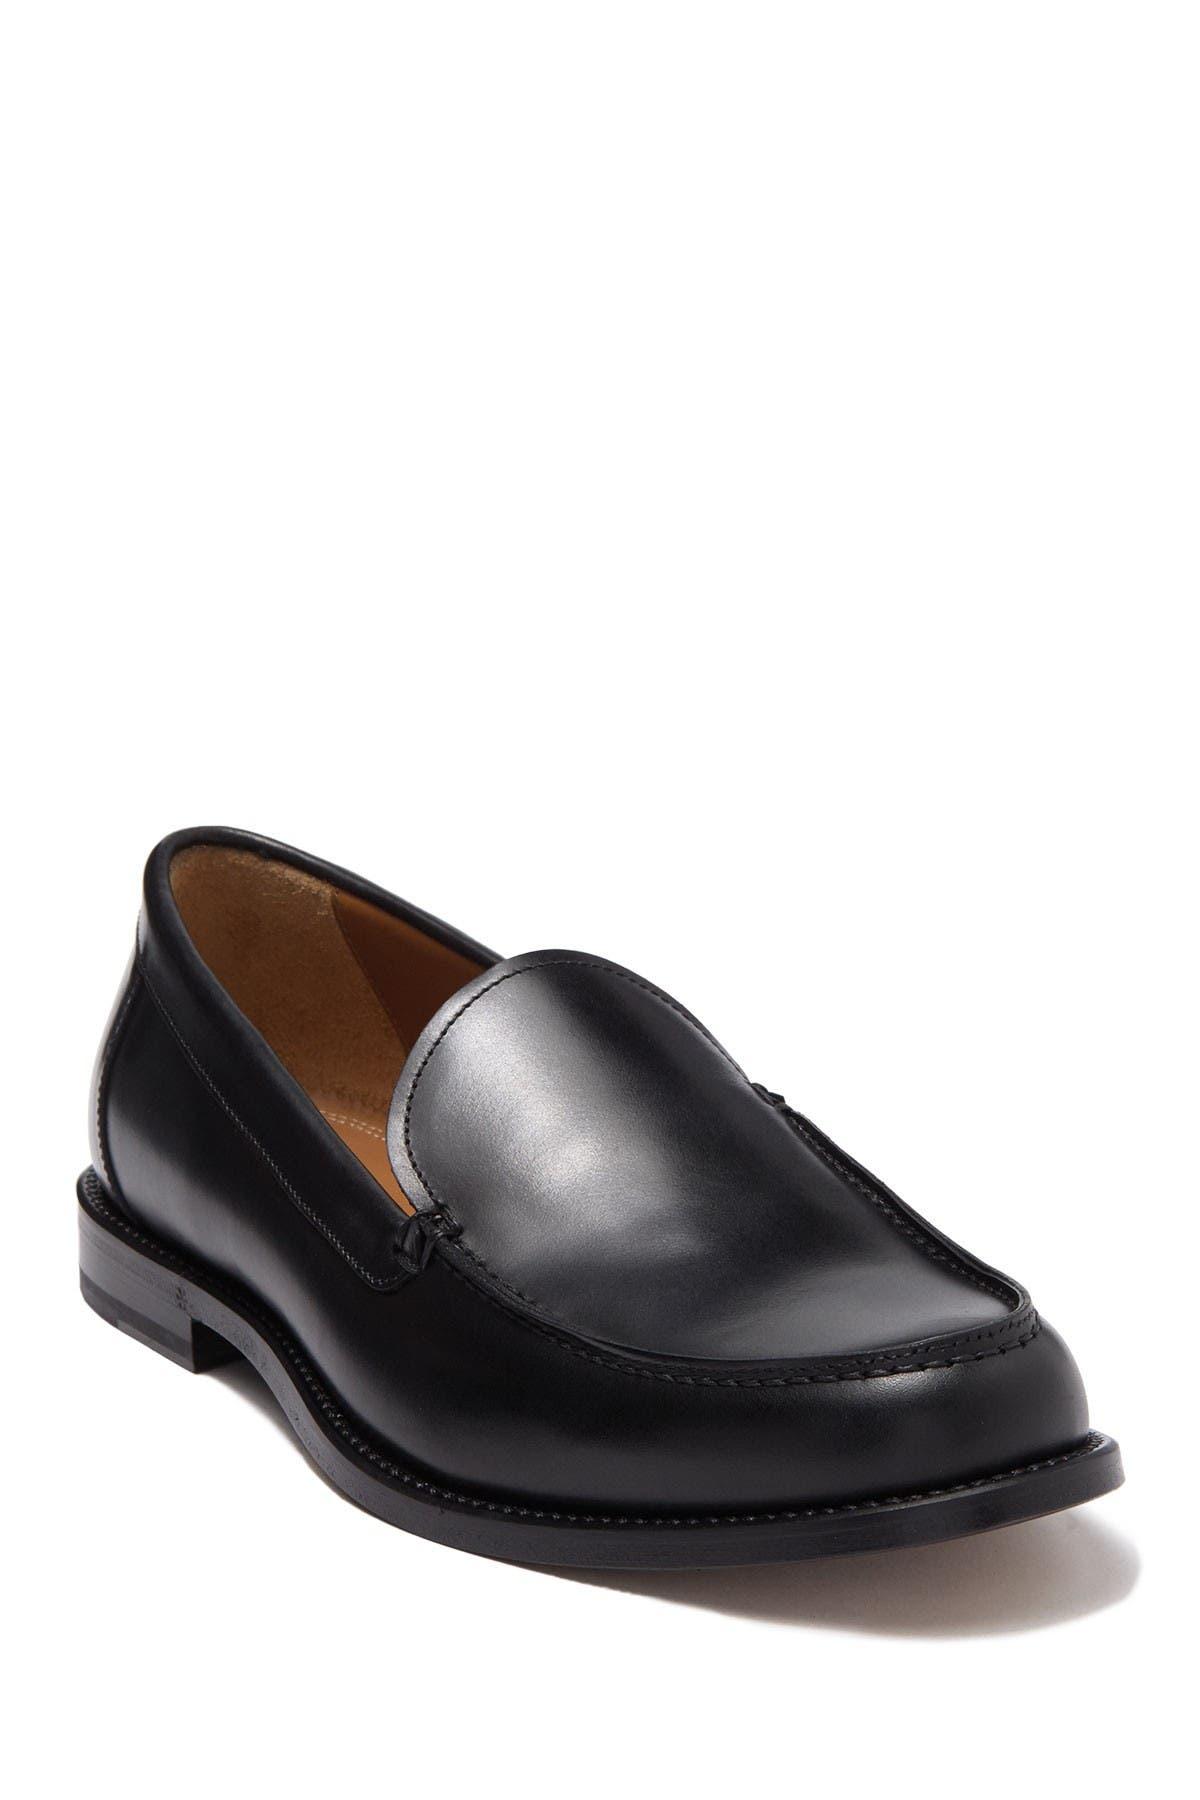 Image of Antonio Maurizi Apron Toe Leather Loafer